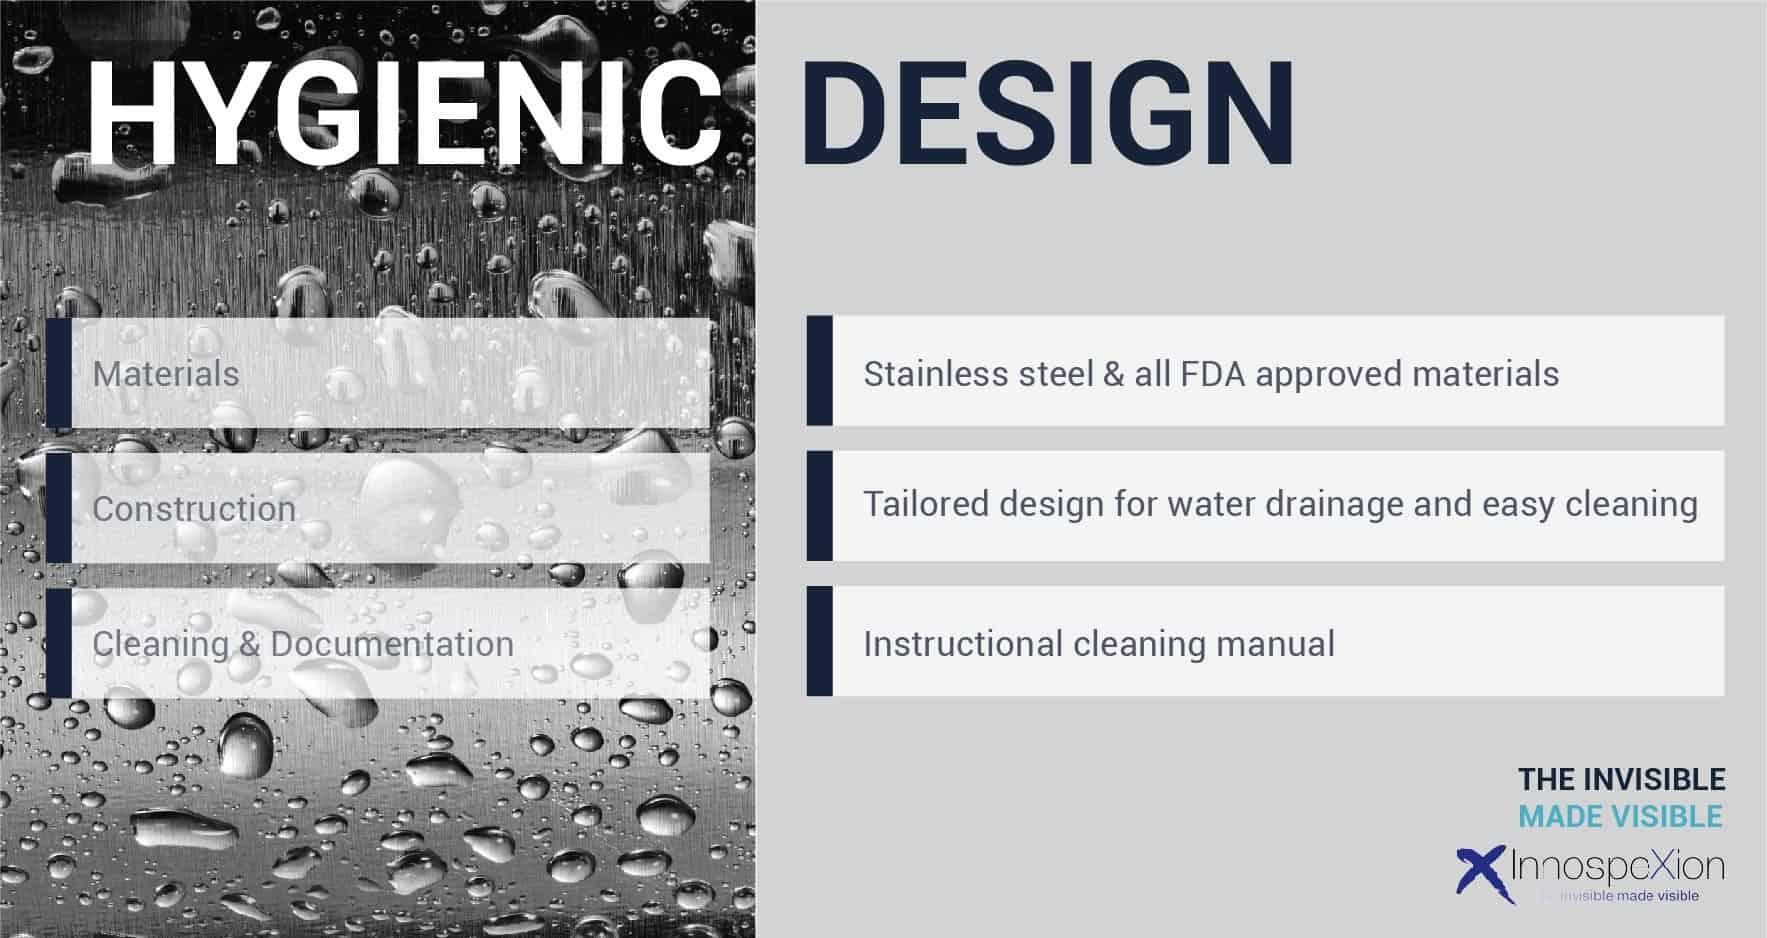 food equipment hygienic design